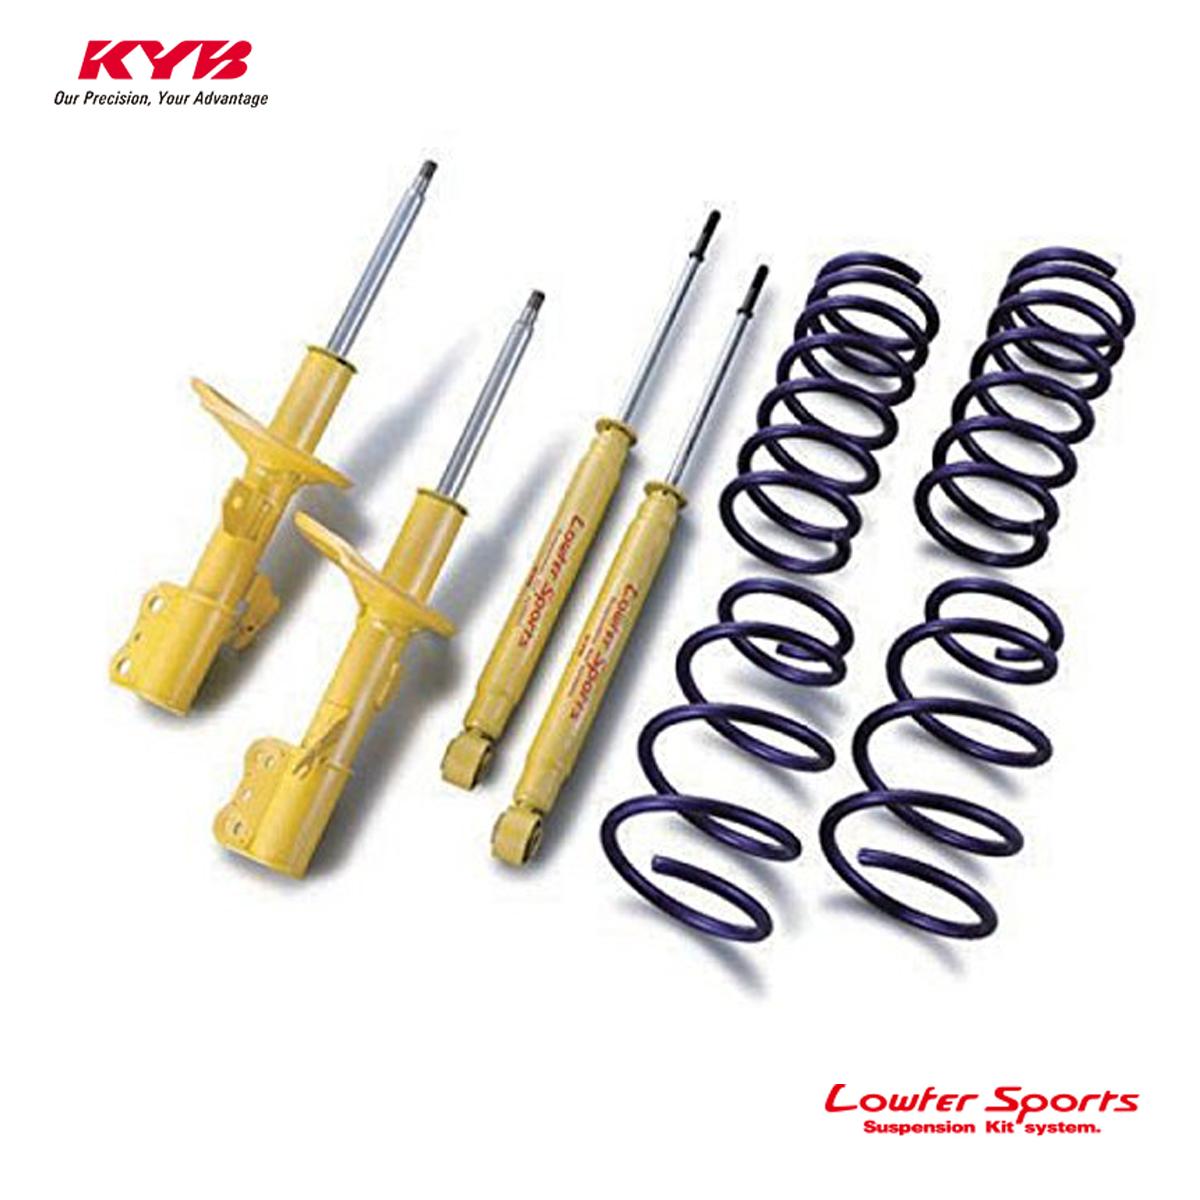 KYB カヤバ CX-5 KE2AW ショックアブソーバー サスペンションキット Lowfer Sports LKIT-KE2AW9 配送先条件有り